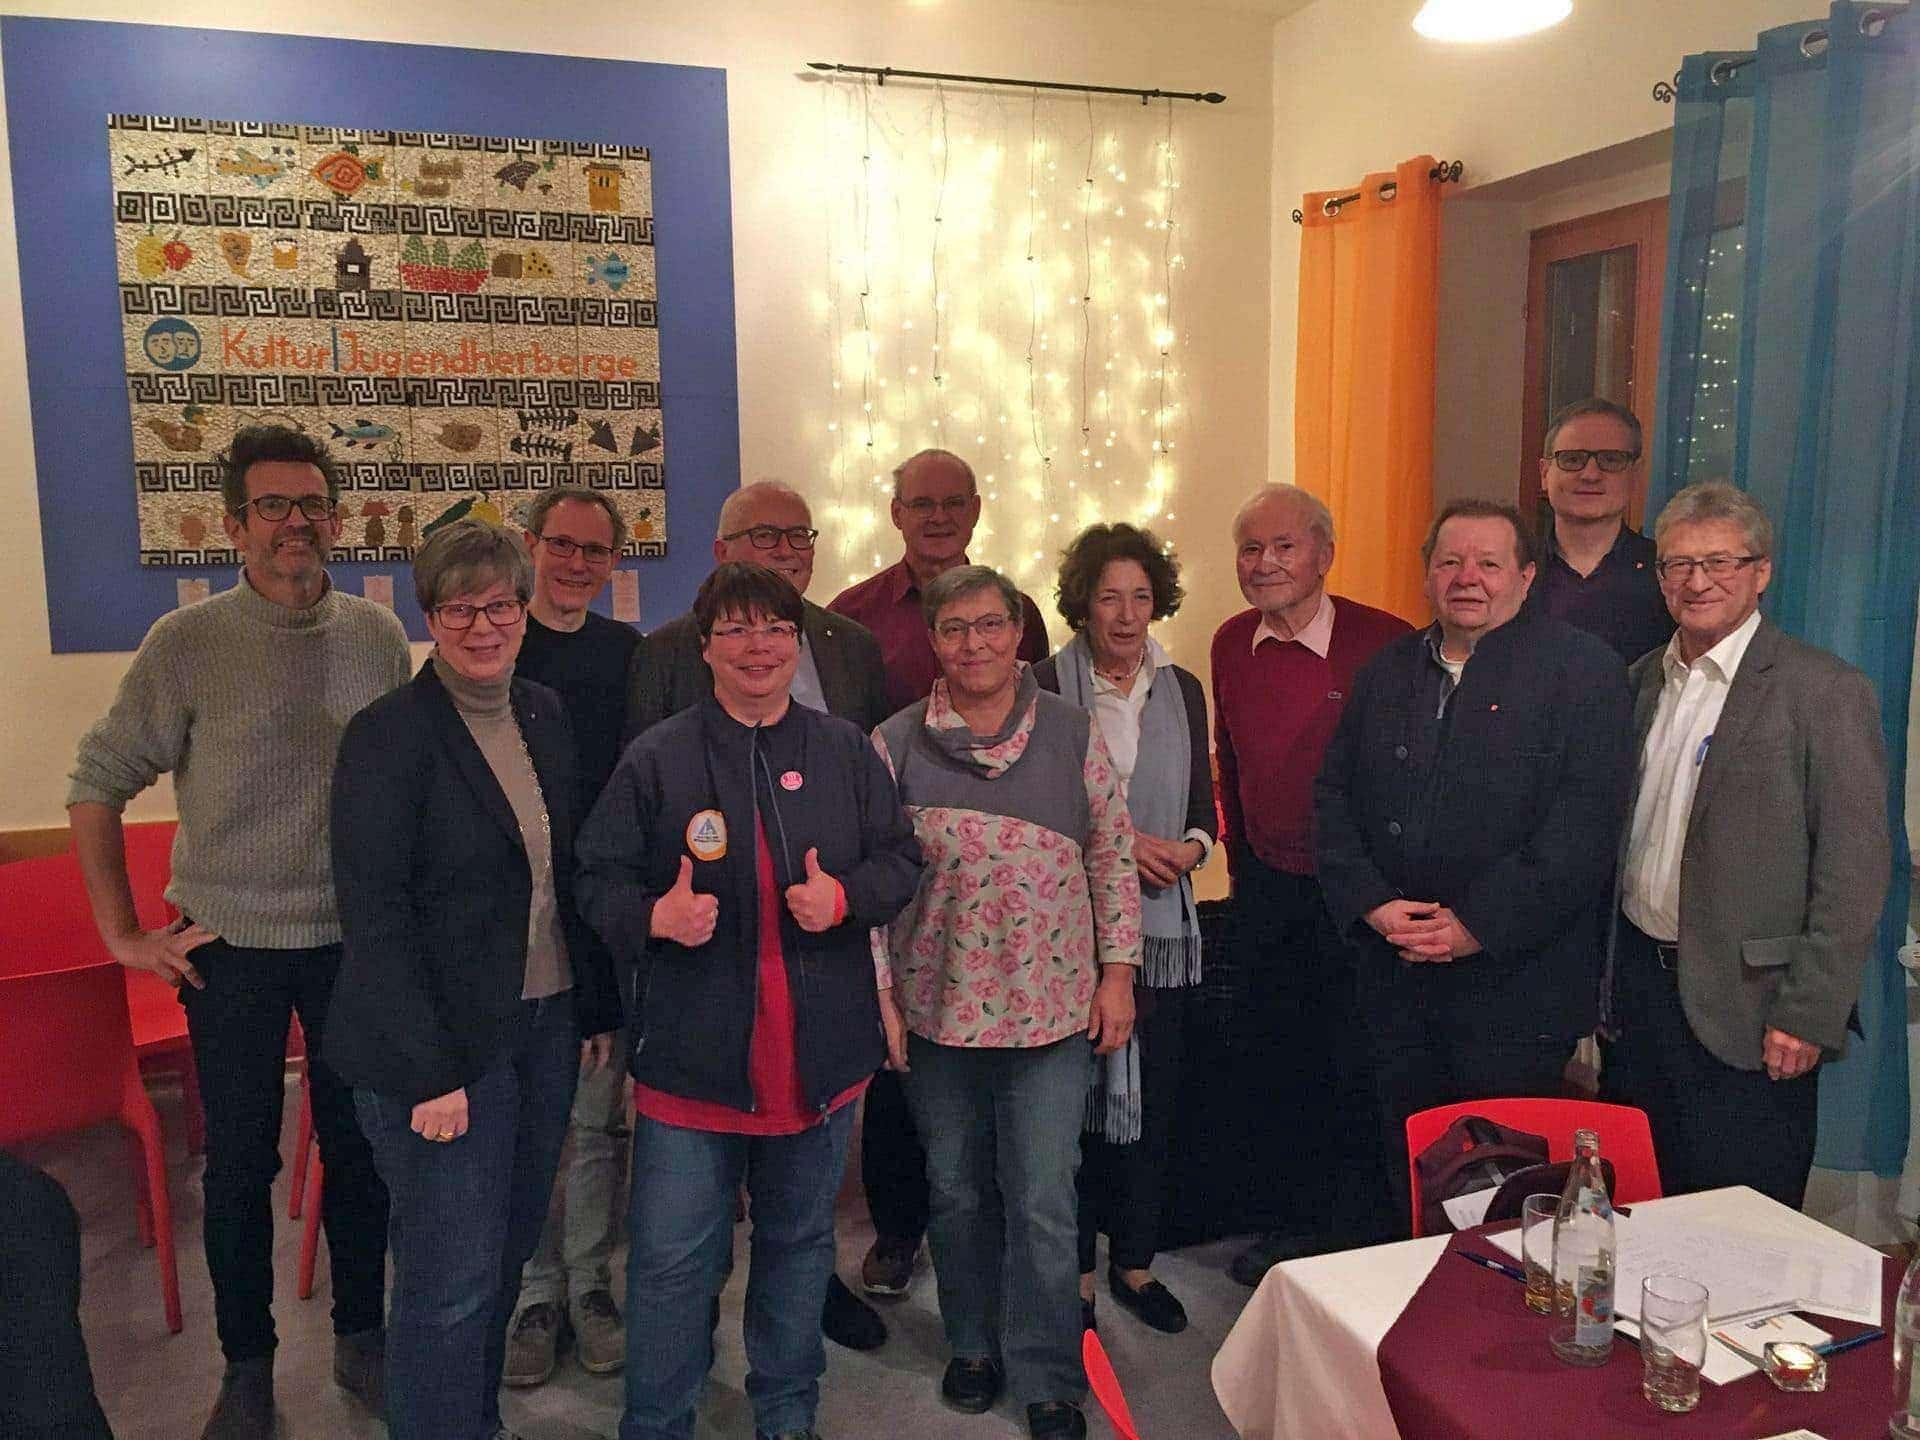 Kultur|Jugendherberge Freundeskreis der Jugendherberge unterstützt Neubau